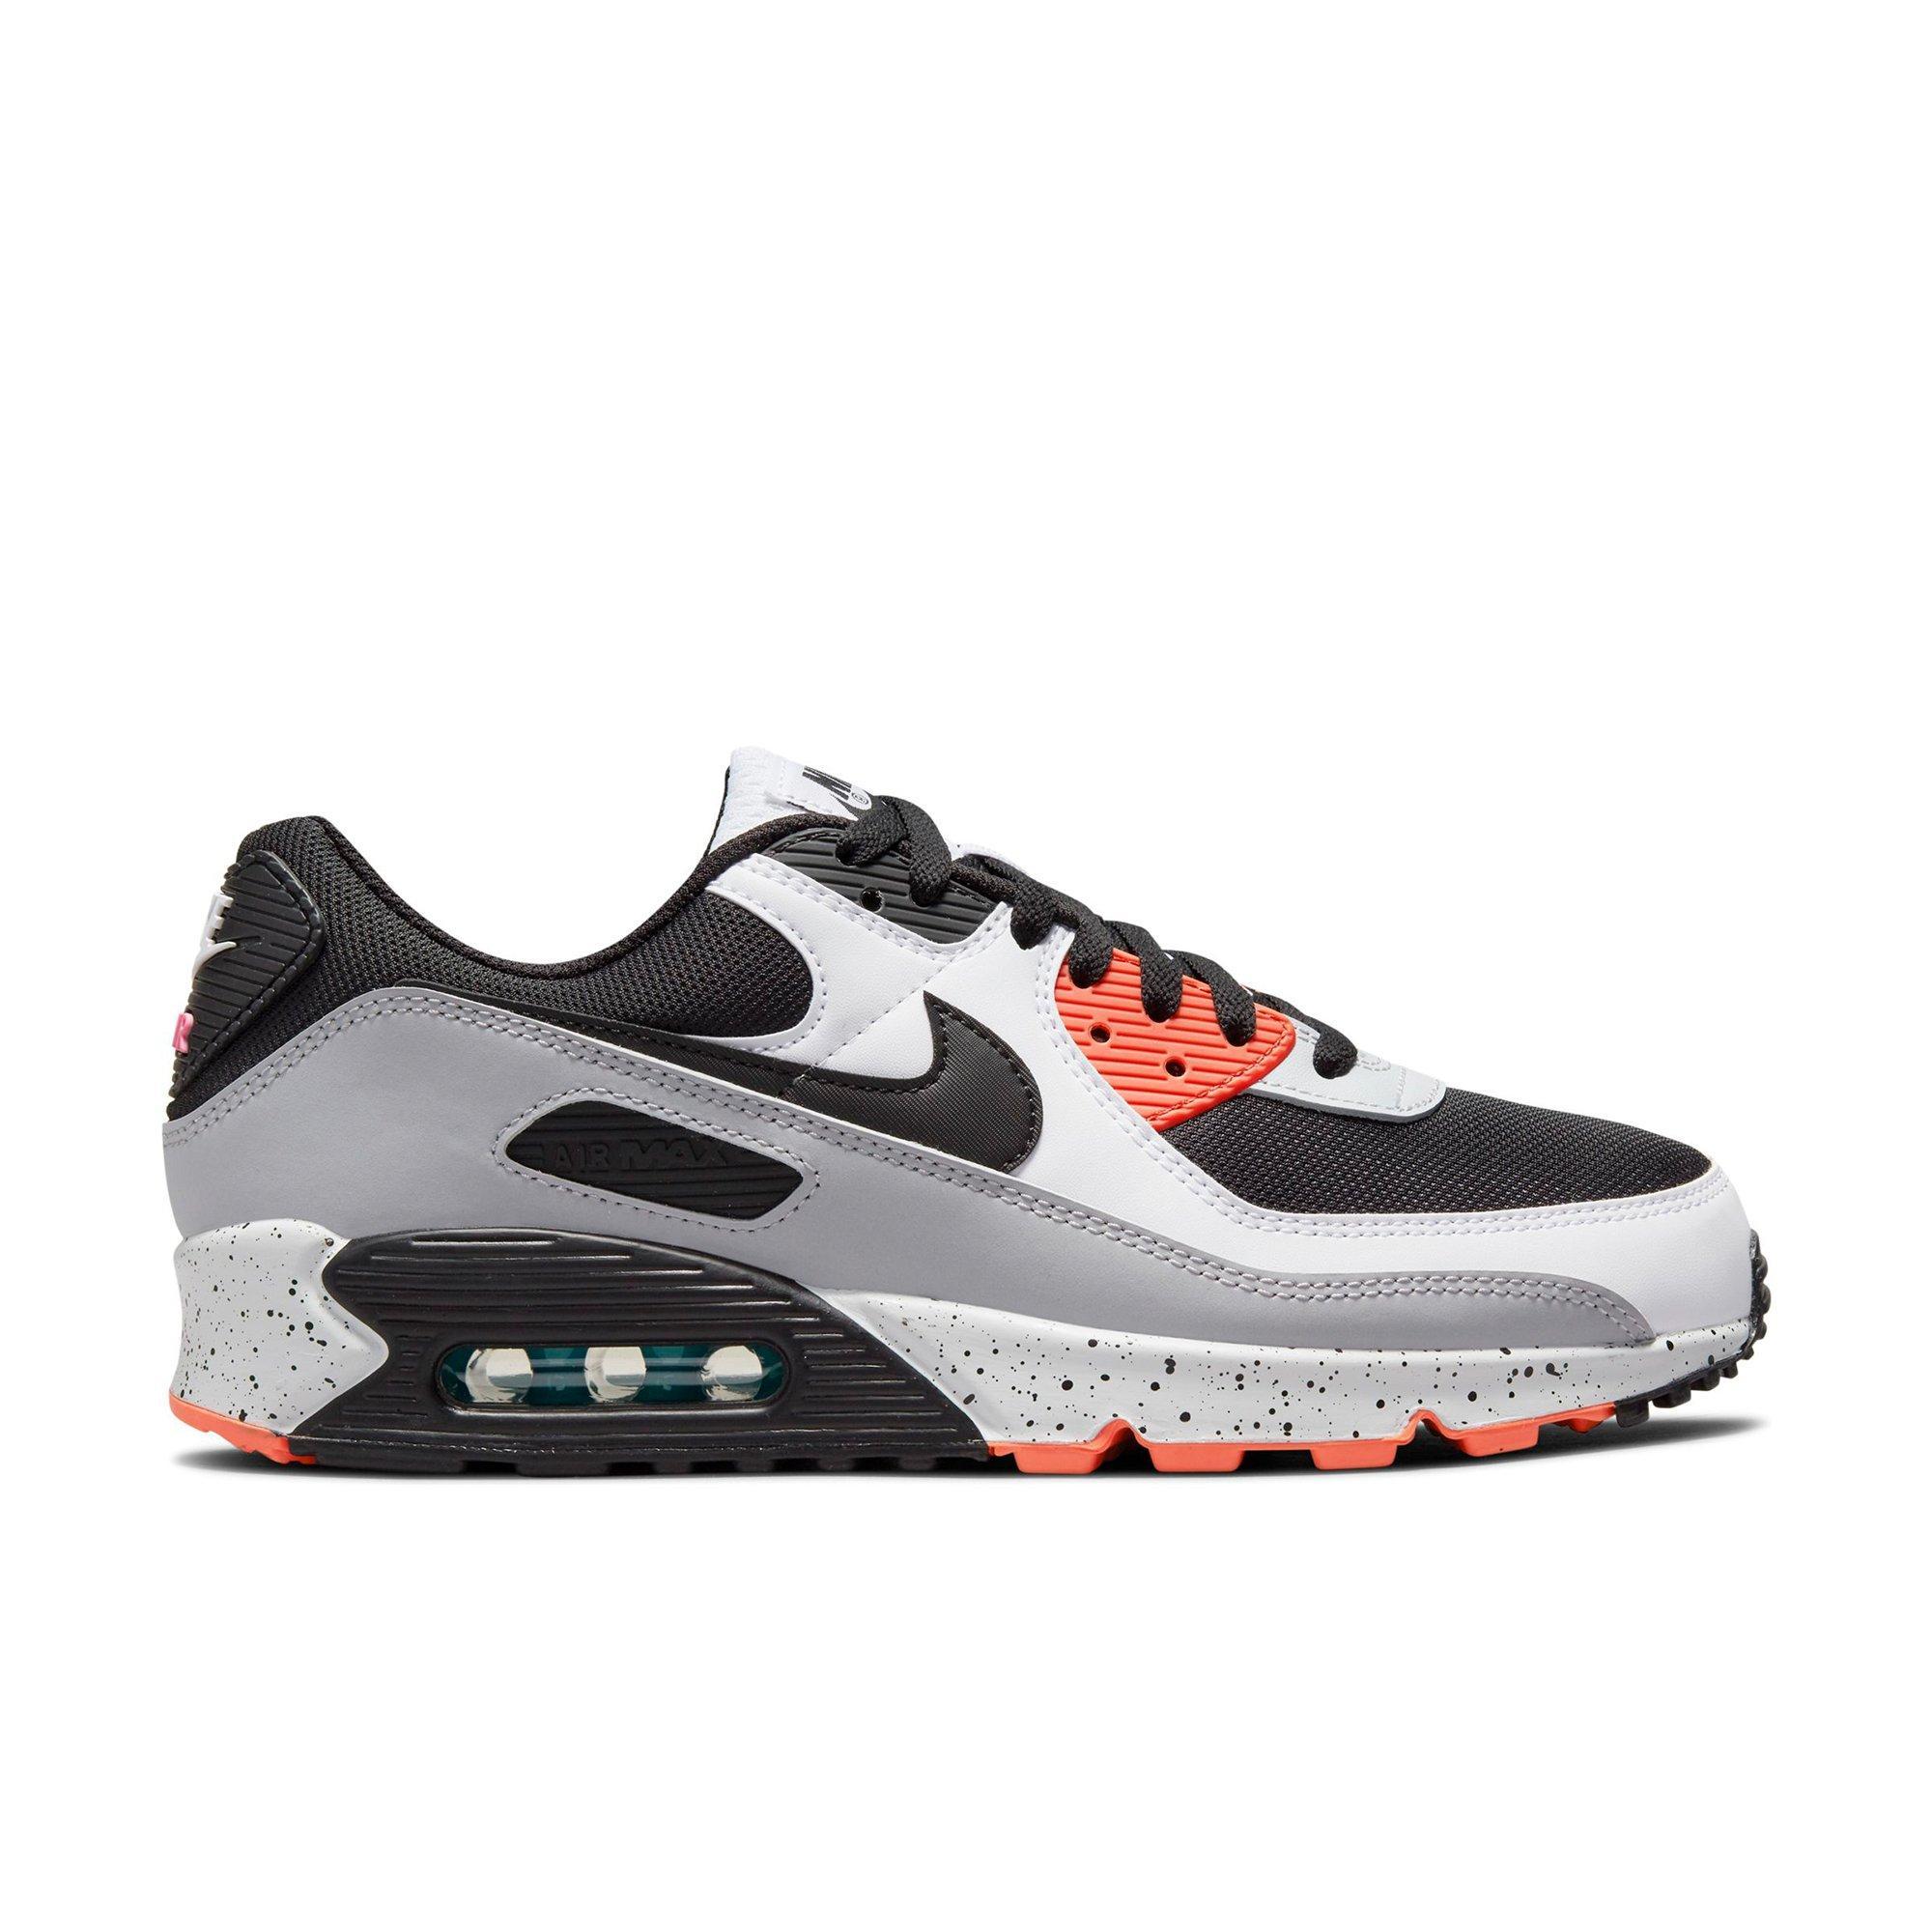 Nike Air Max 90 'White/Black/Turf Orange/Aquamarine